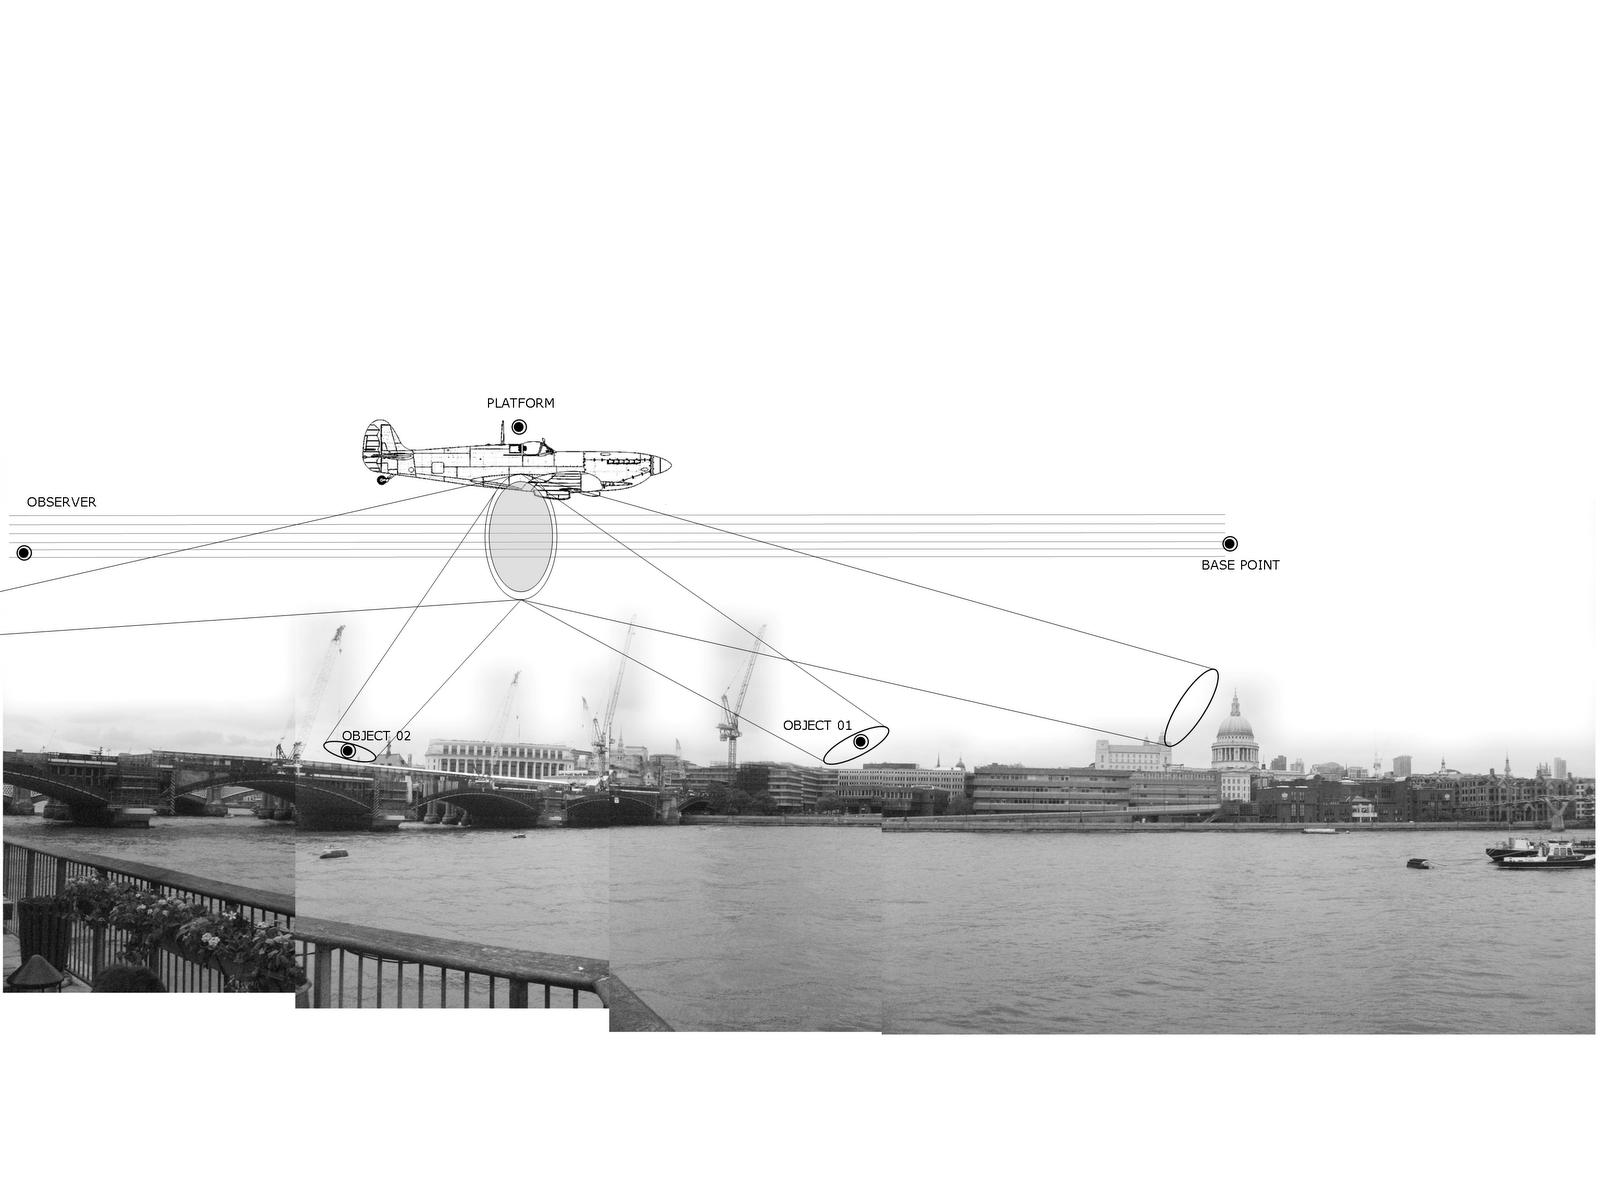 camera obscura diagram royal enfield bullet 500 wiring isik hong concept